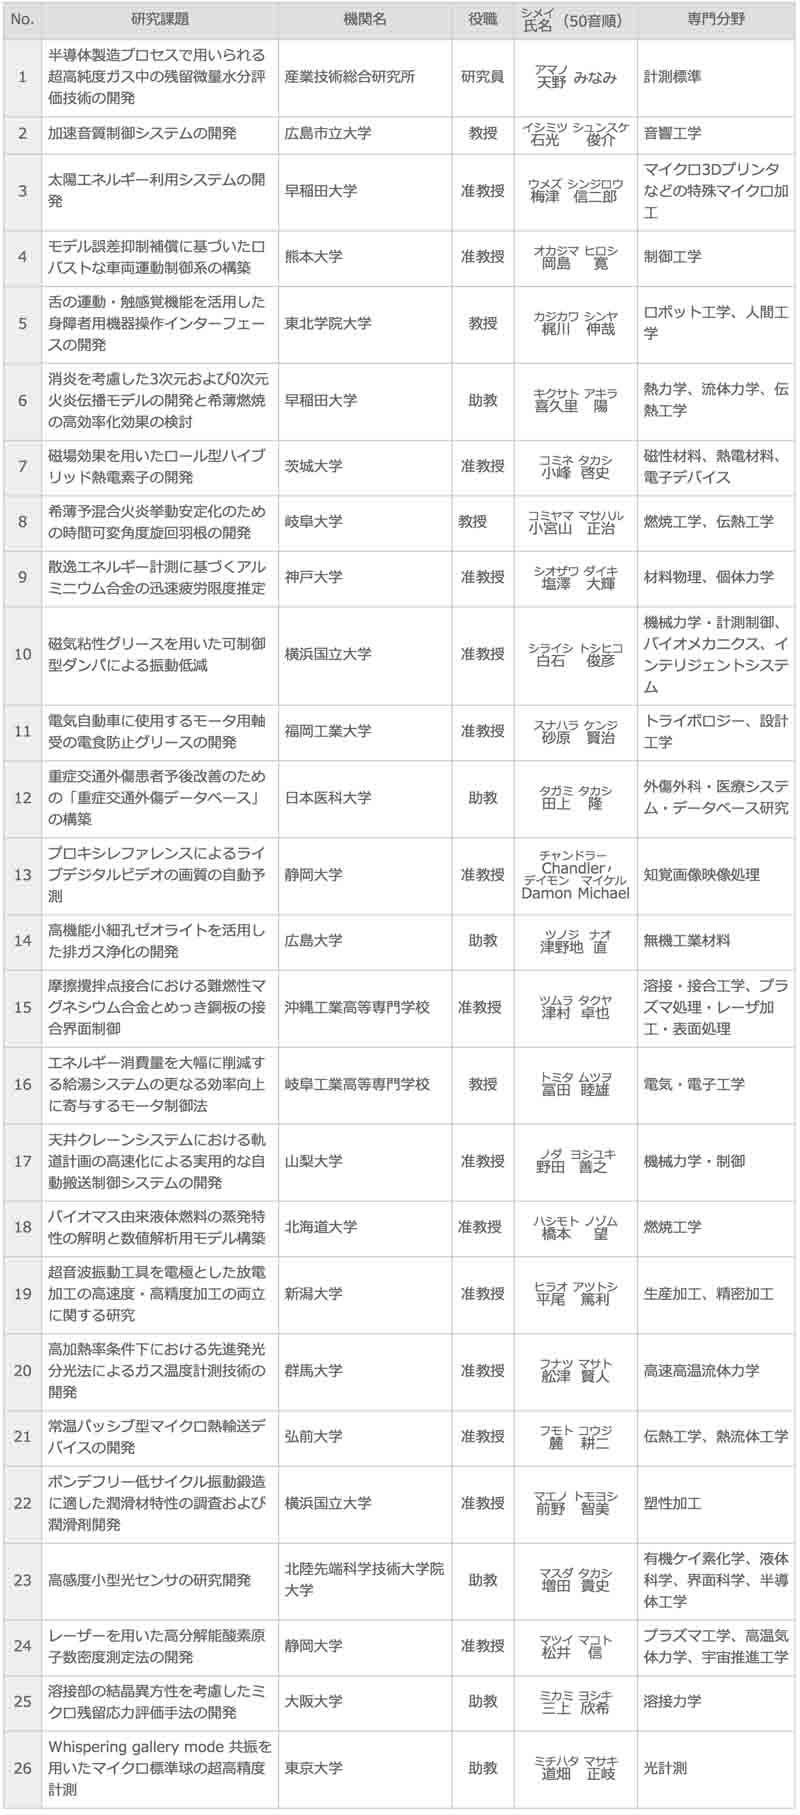 suzuki-foundation-announced-the-academic-grants-of-2015-20160219-2